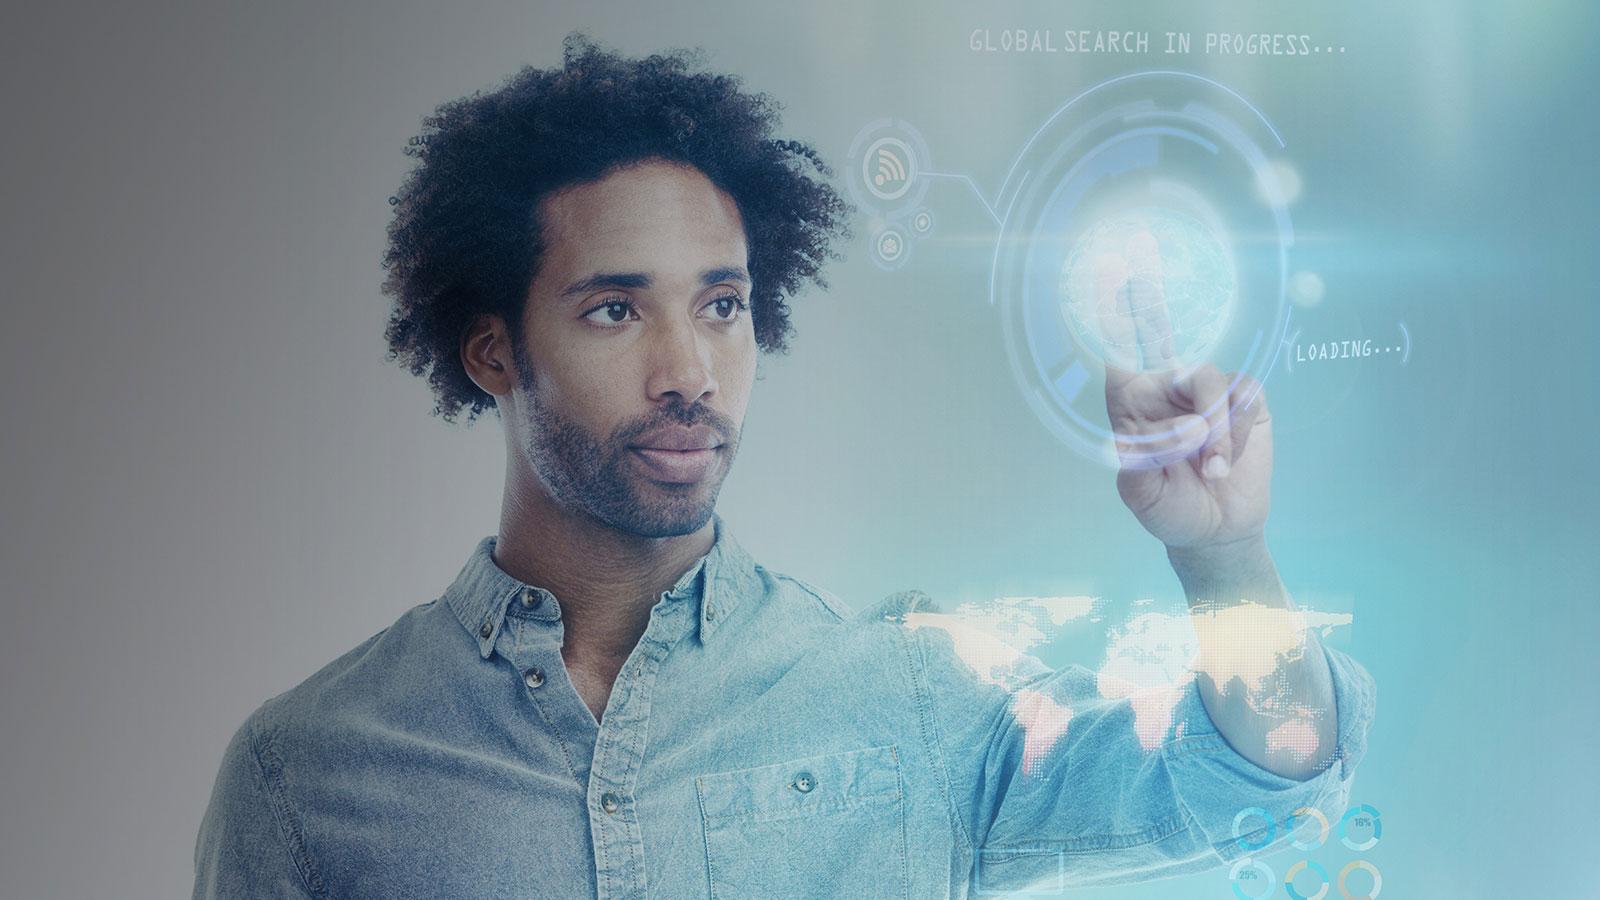 Digital representation of man doing global search